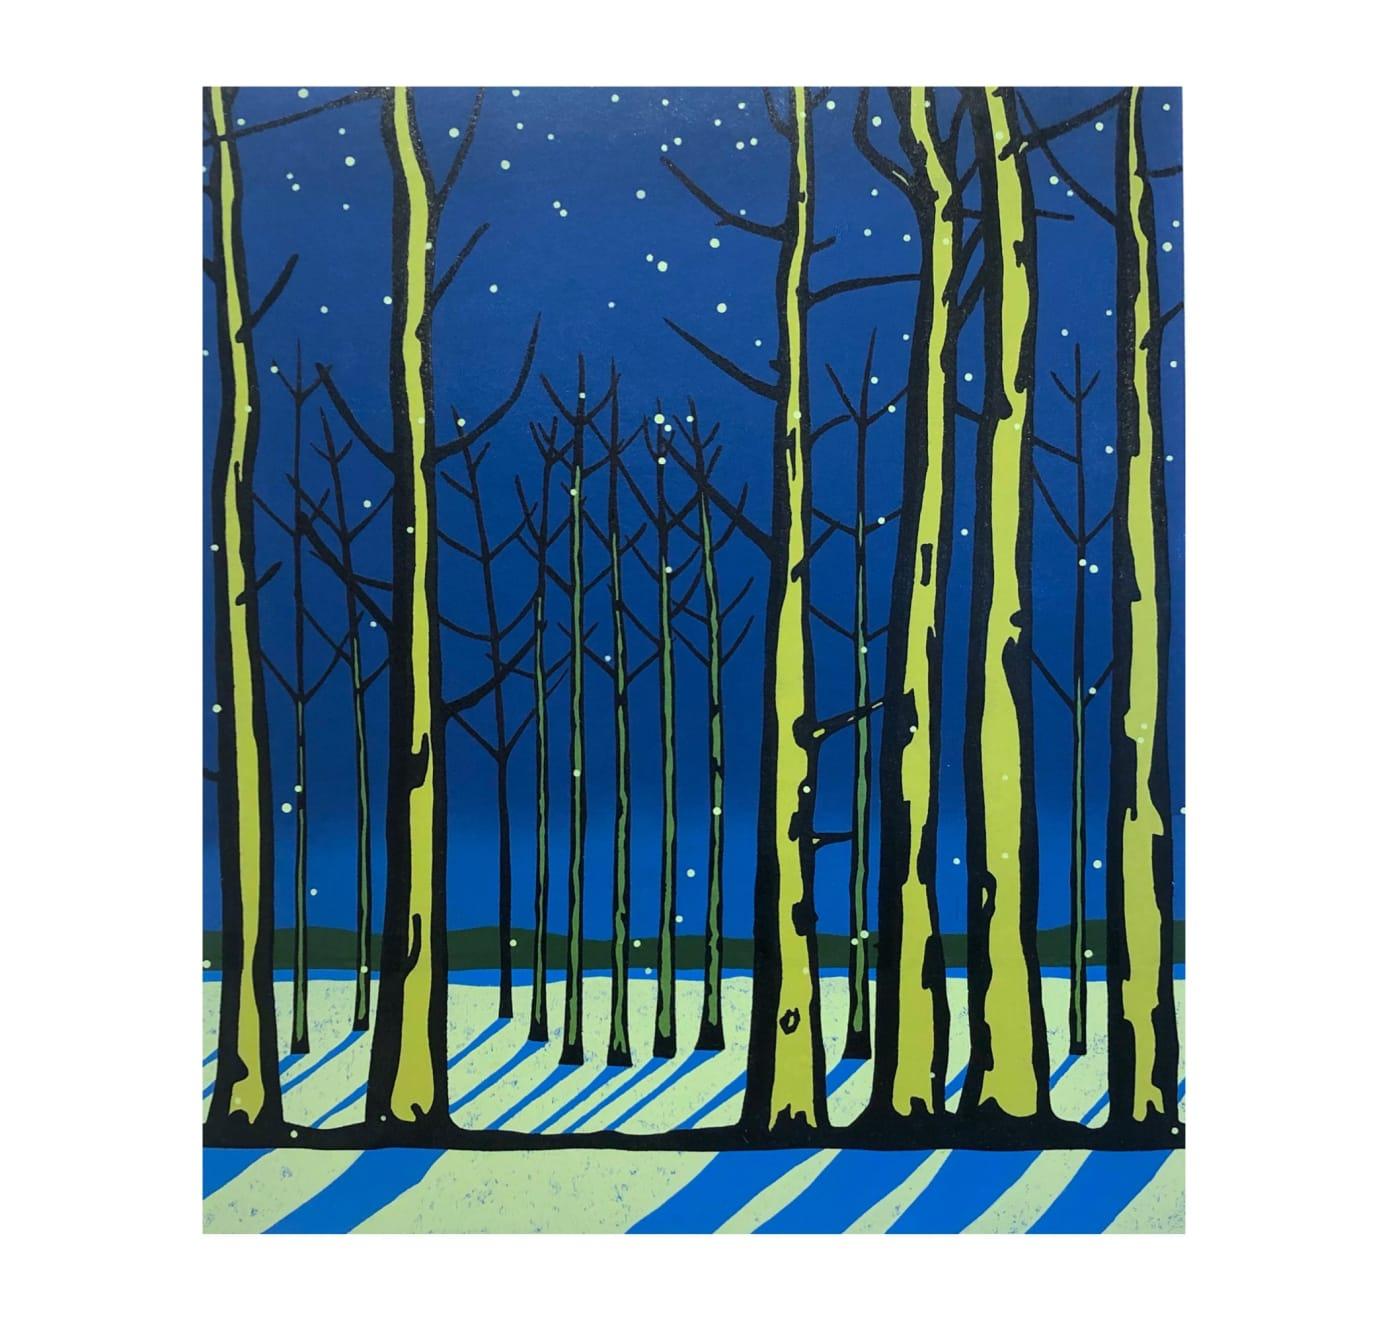 Paul Hogg, Snowy Evening (Homage to Robert Frost), 2020